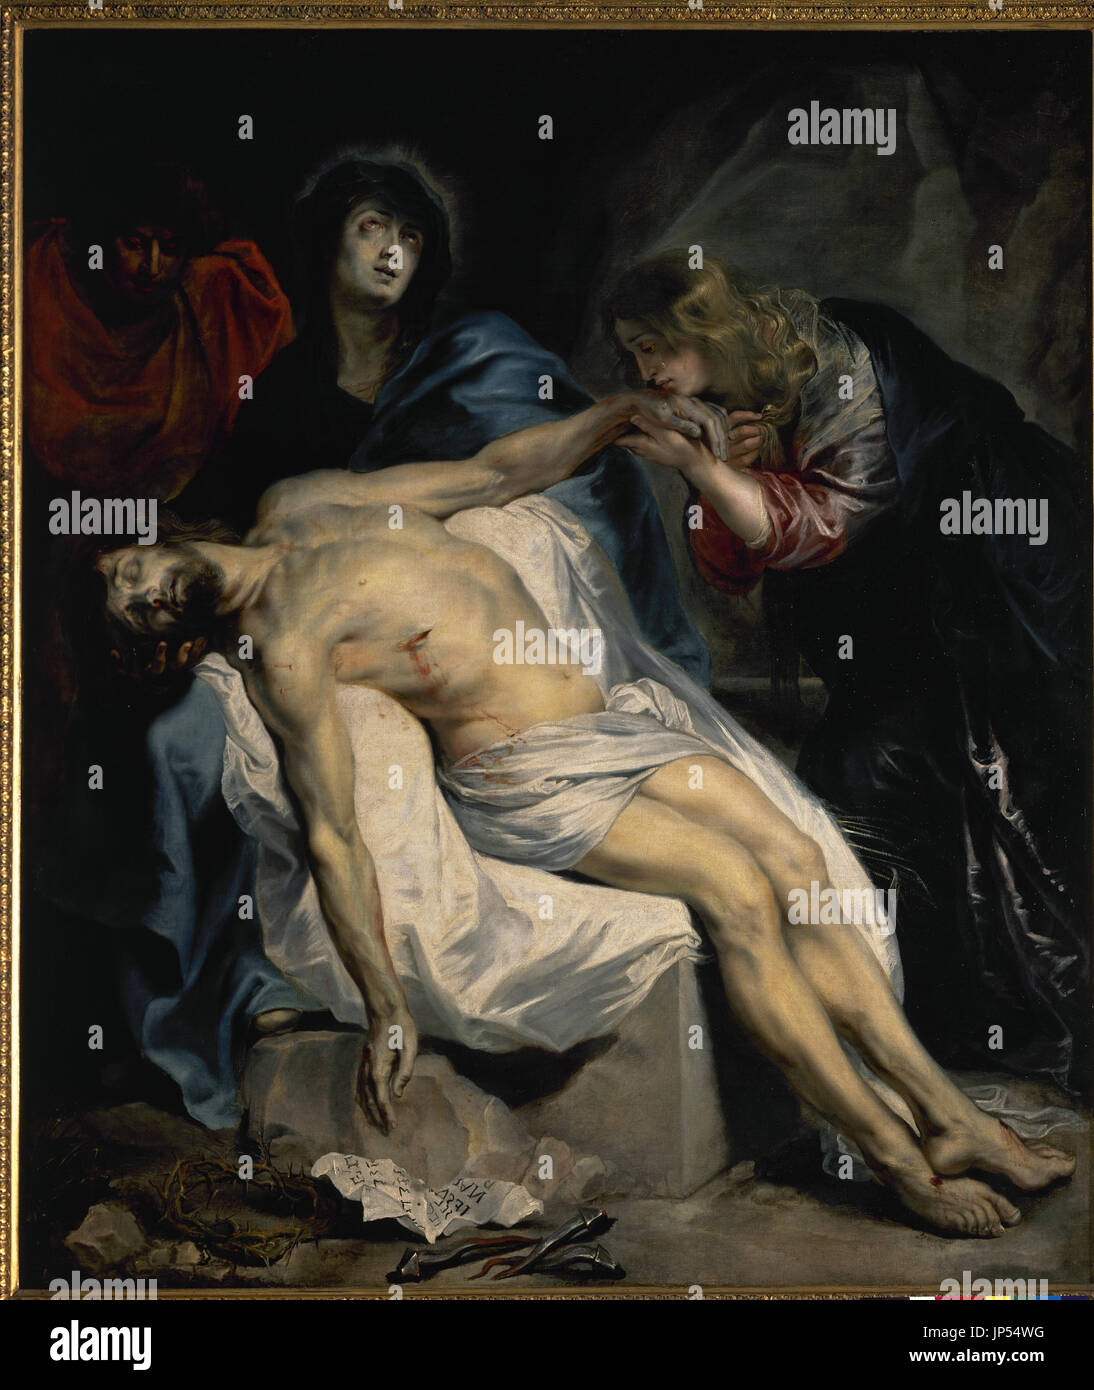 Anton van Dyckt (1599-1641). Flemish painter. The Pity, 1618-1620. Prado Museum. Madrid. Spain. - Stock Image